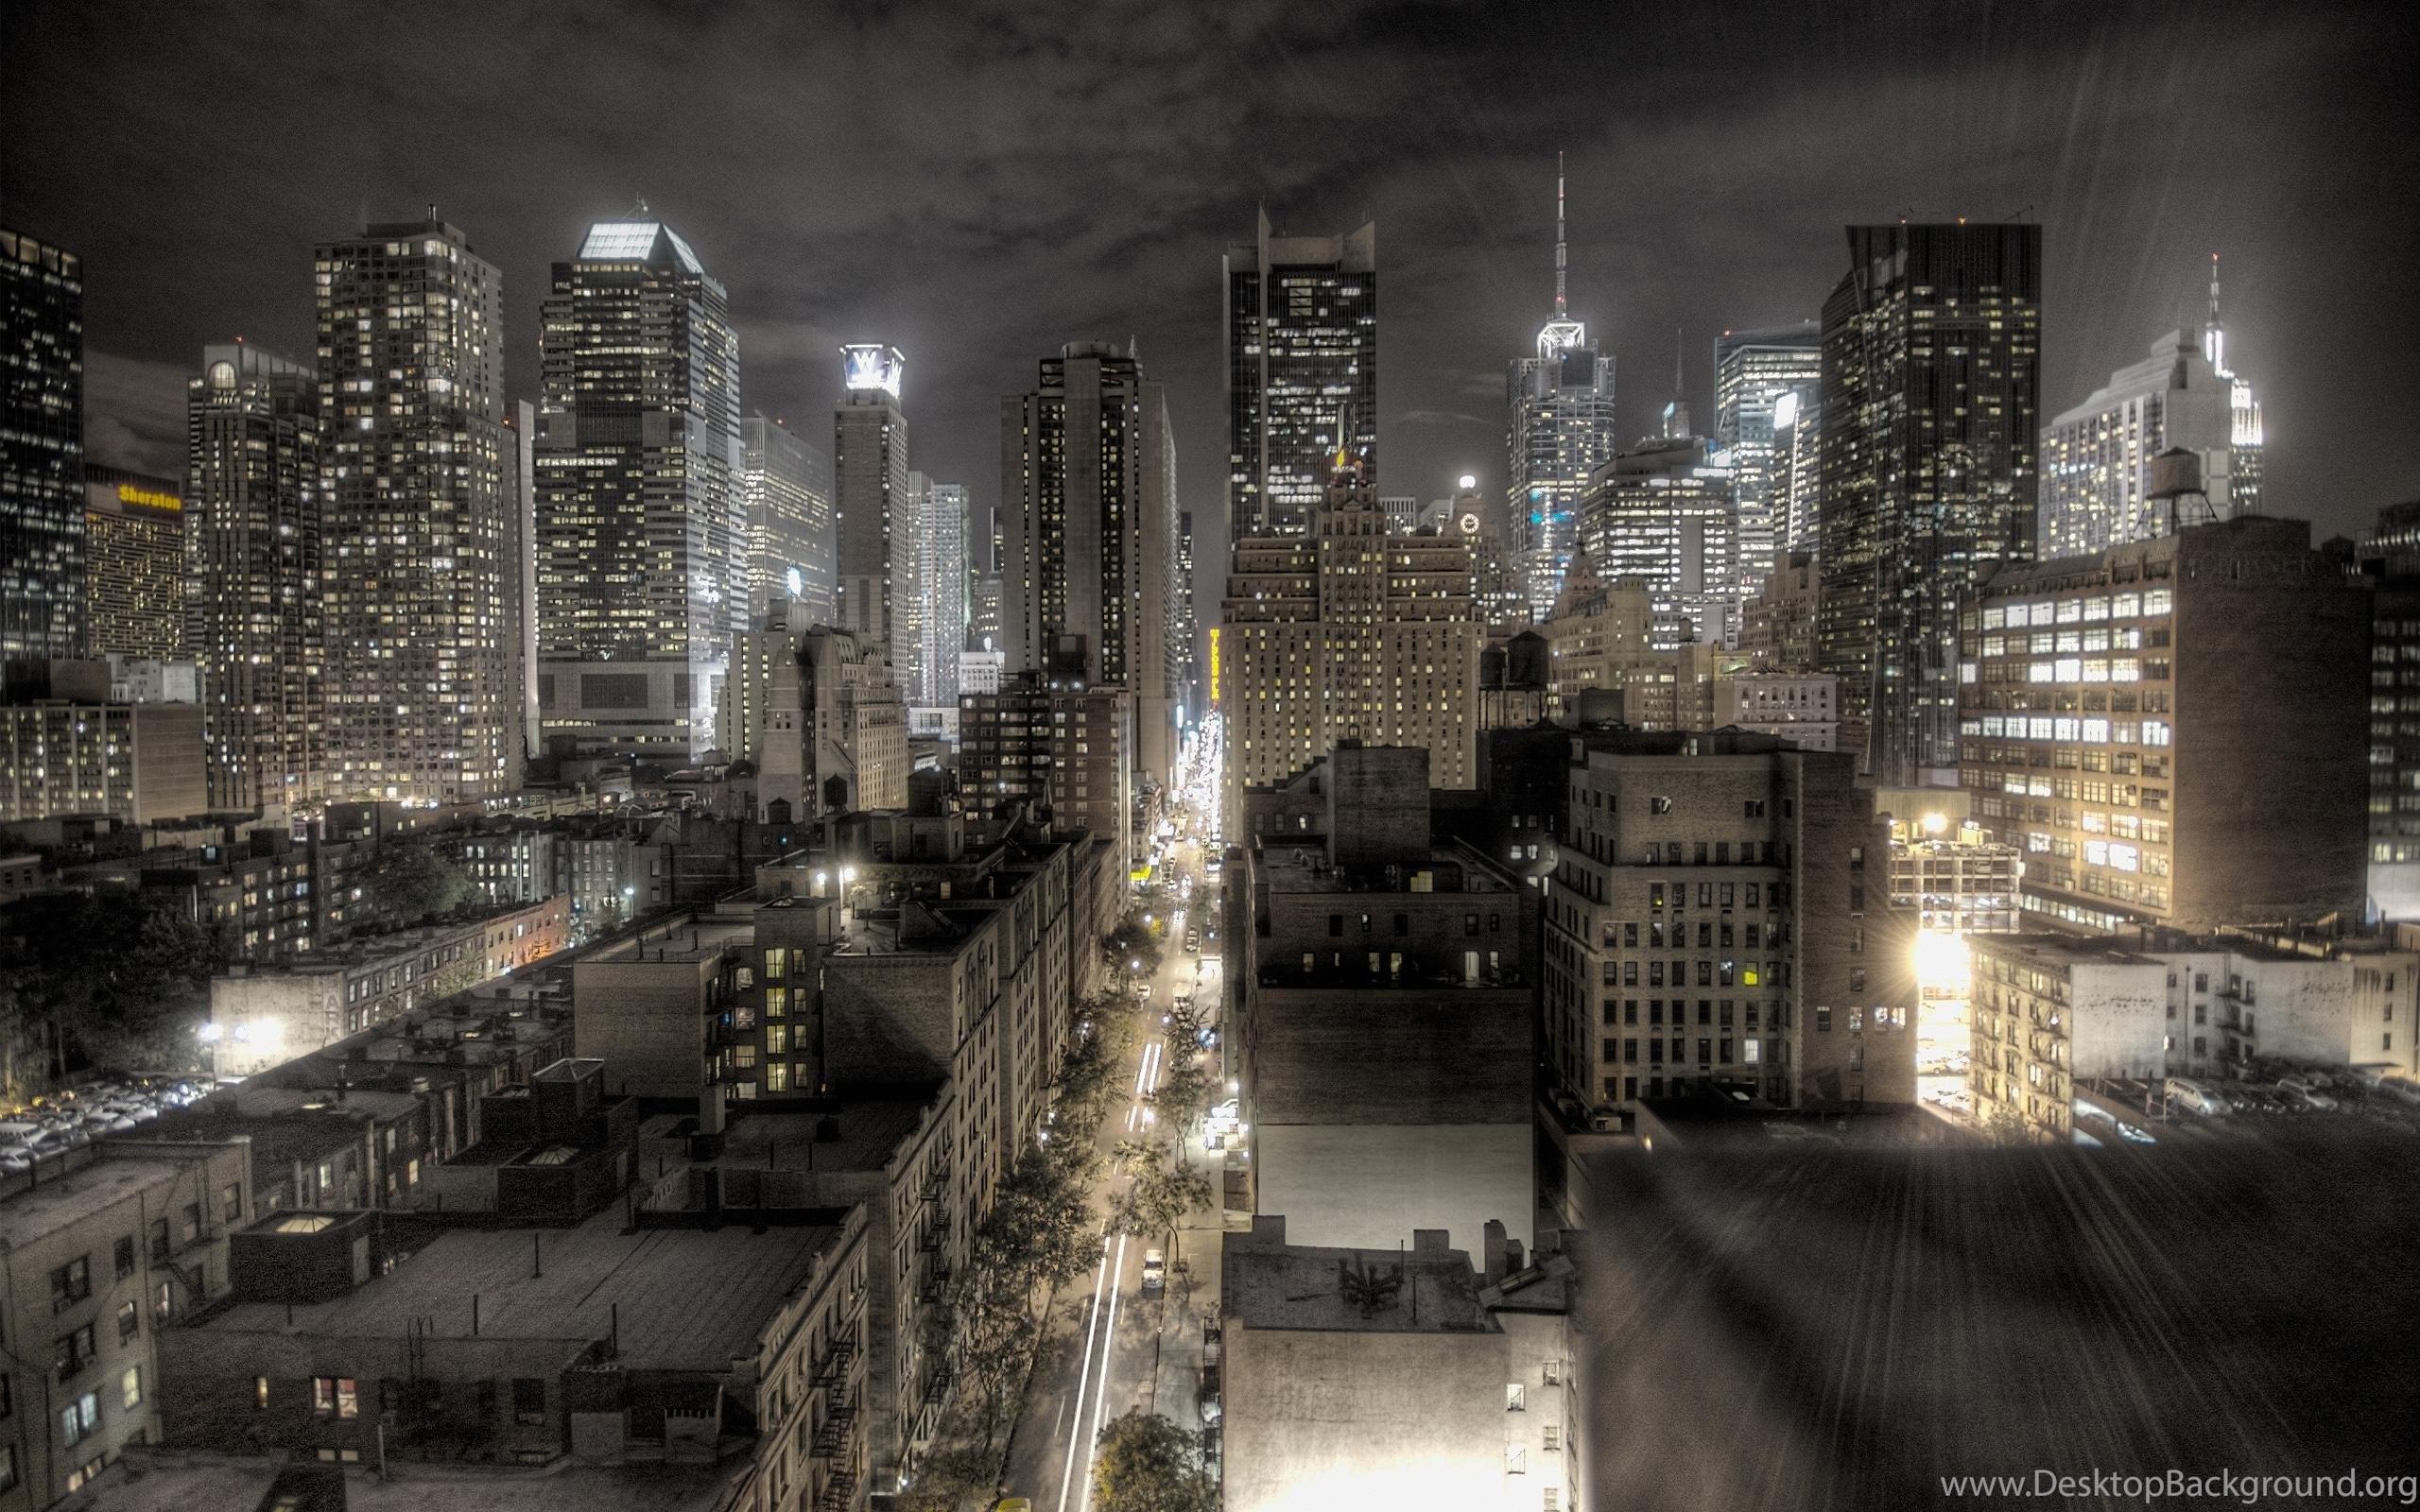 Dark newyork city wallpaper dark hd wallpaper city hd - Dark background wallpaper hd ...